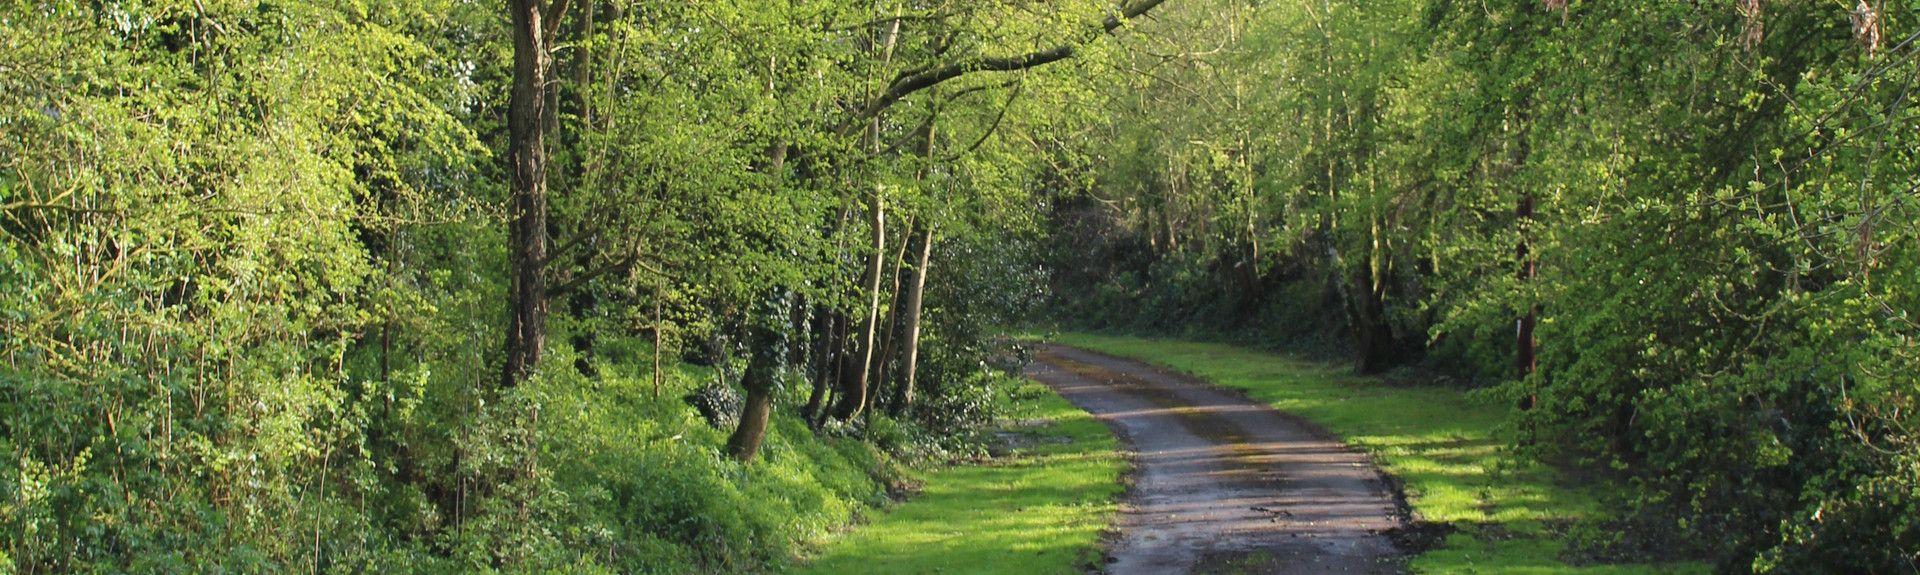 Somerford Keynes, Cirencester, Inglaterra, Reino Unido